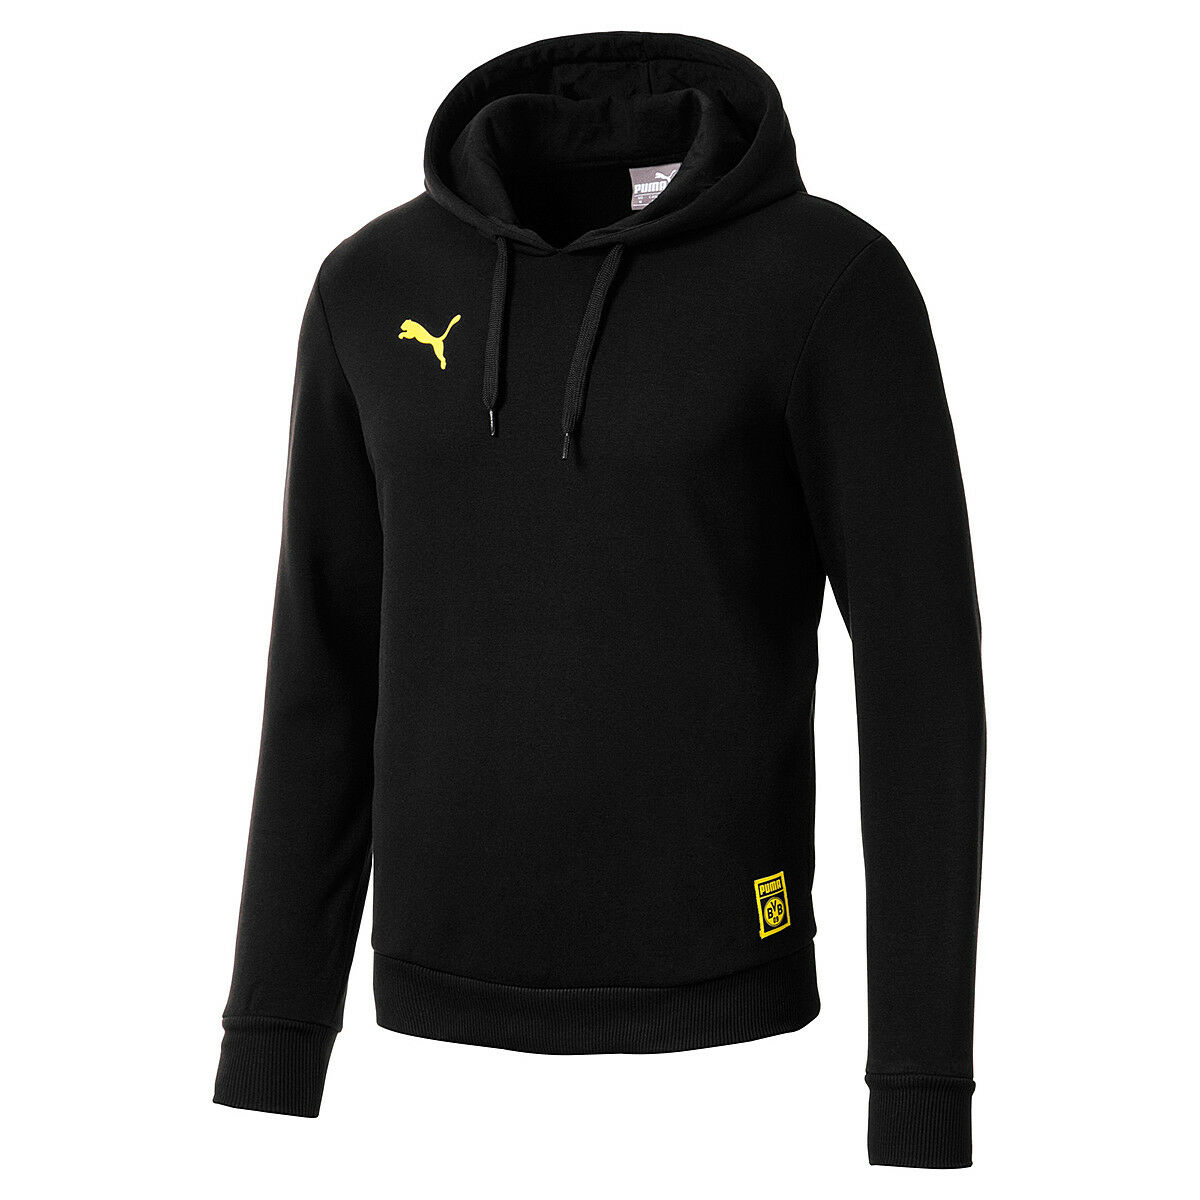 Puma BVB Premium Stencil Hoody Borussia Dortmund 09 Herren Sweatshirt 754110 02